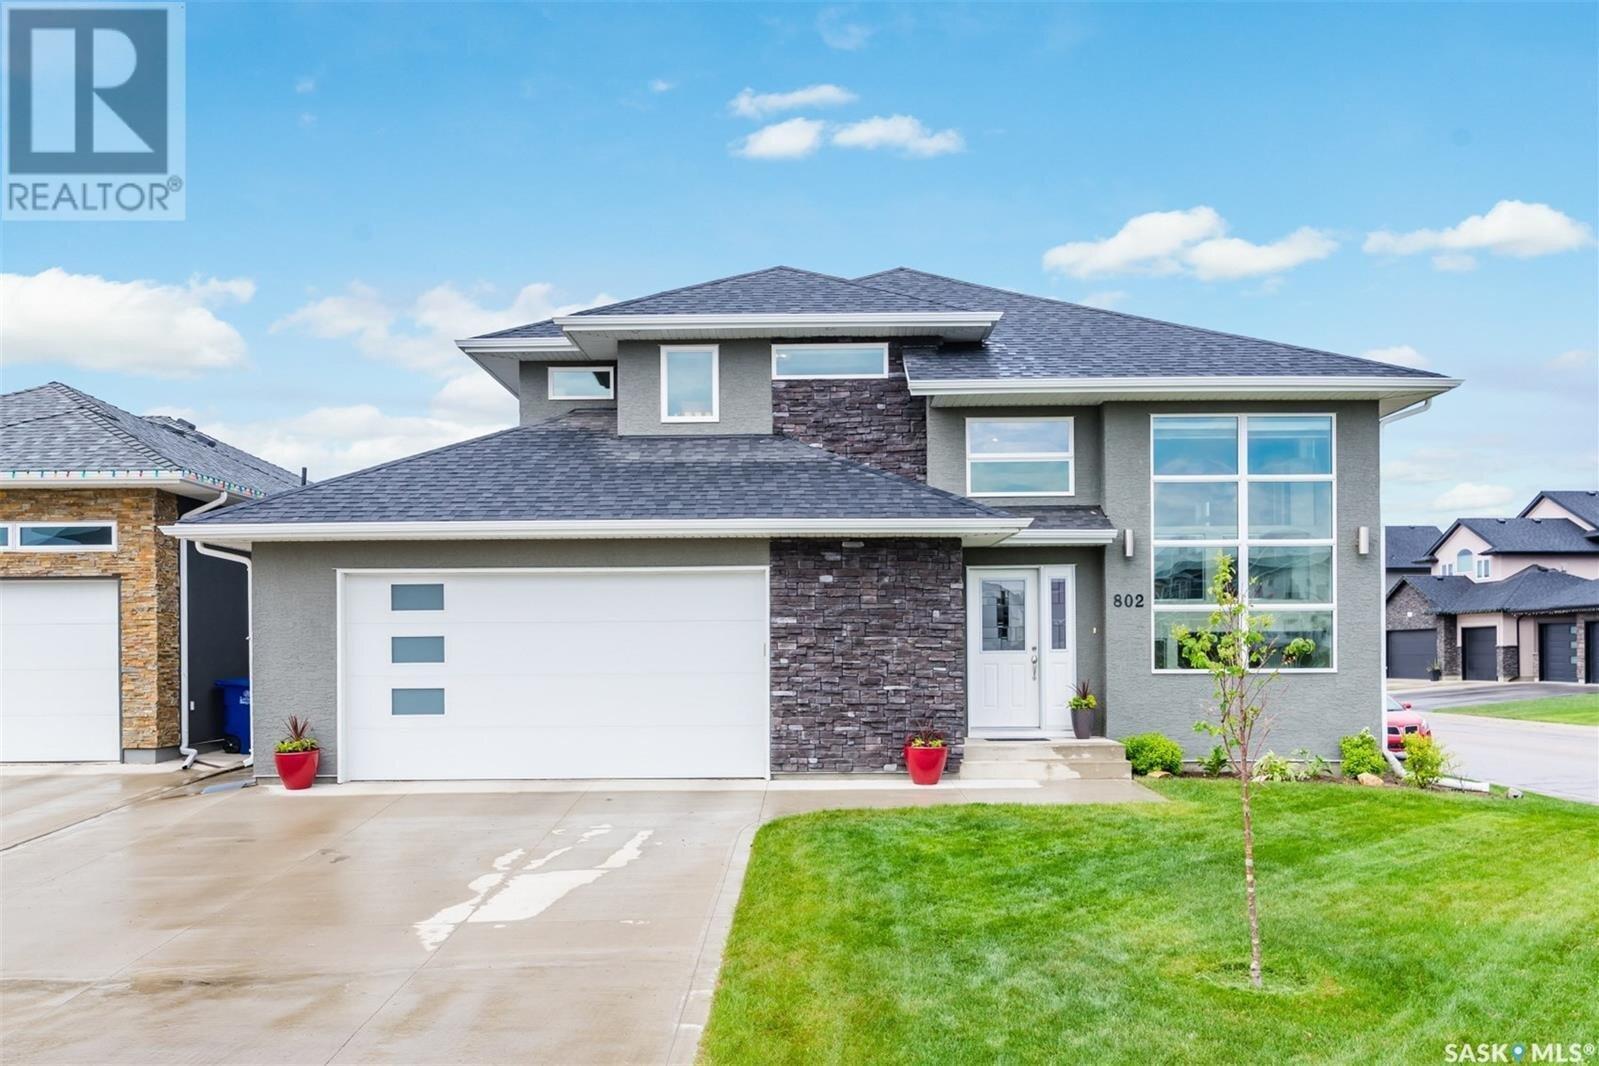 House for sale at 802 Salloum Cres Saskatoon Saskatchewan - MLS: SK838852